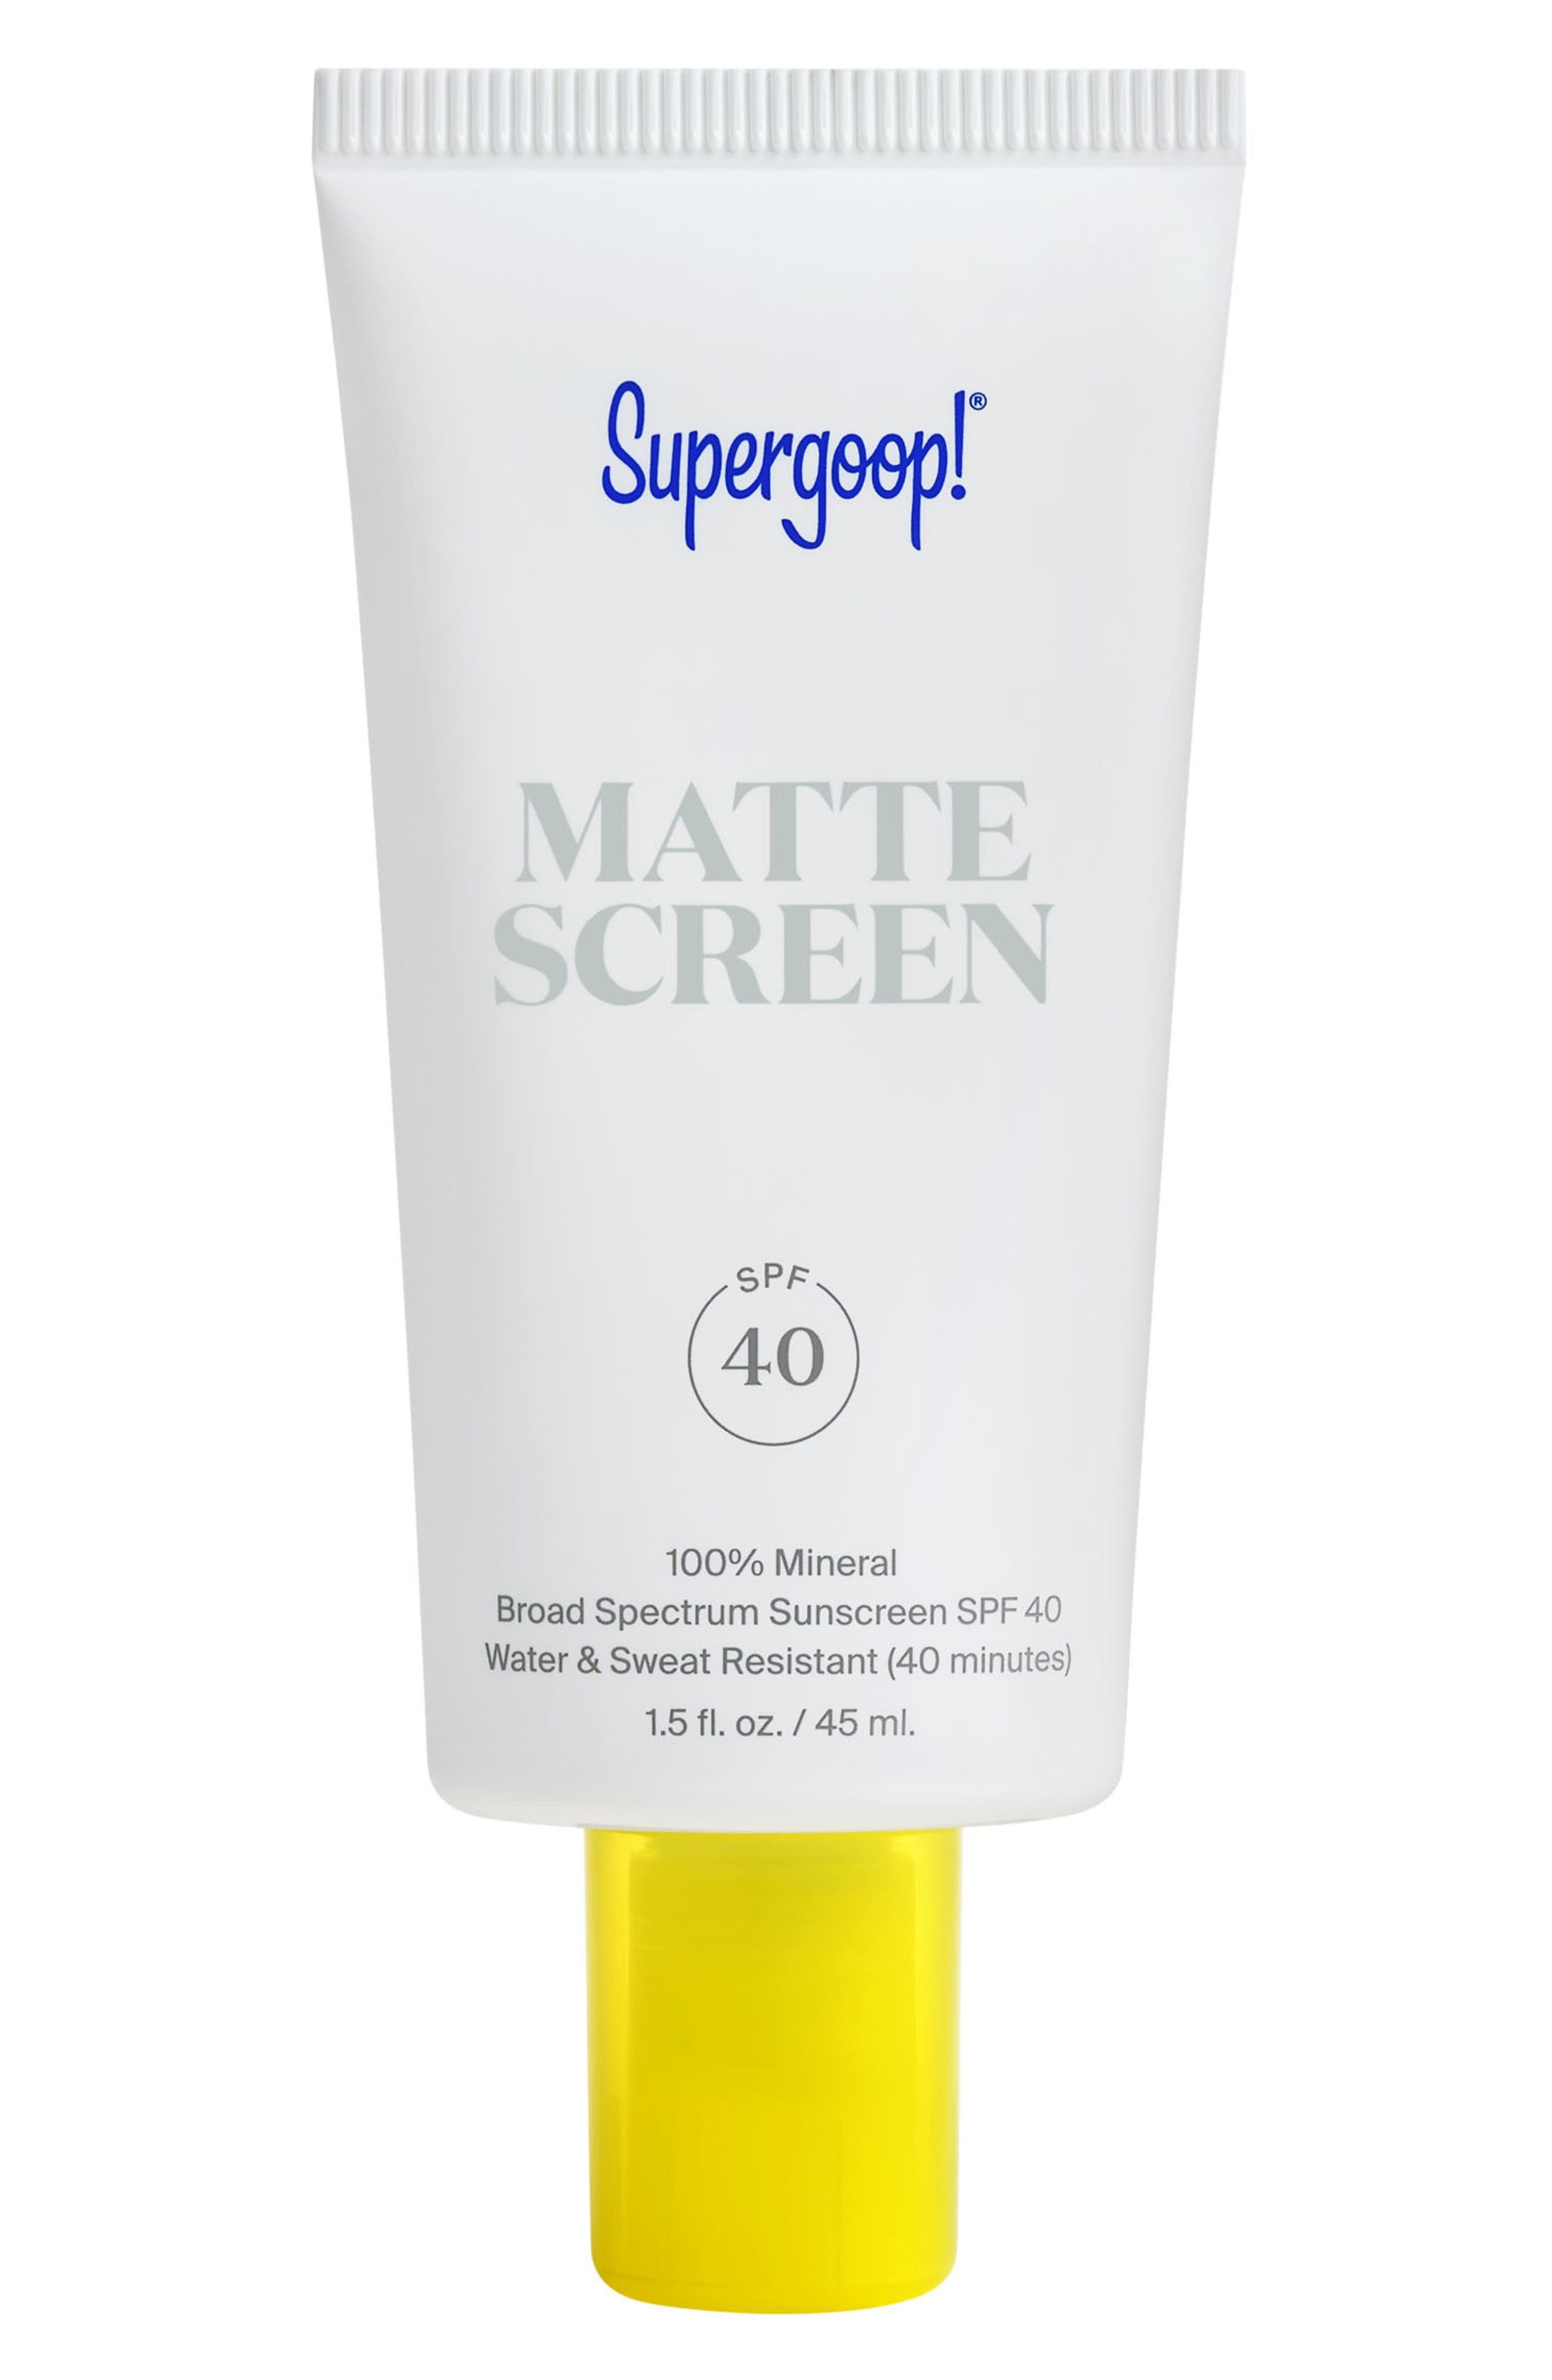 Supergoop! Smooth & Poreless 100% Mineral Matte Screen Sunscreen SPF 40 | Nordstrom